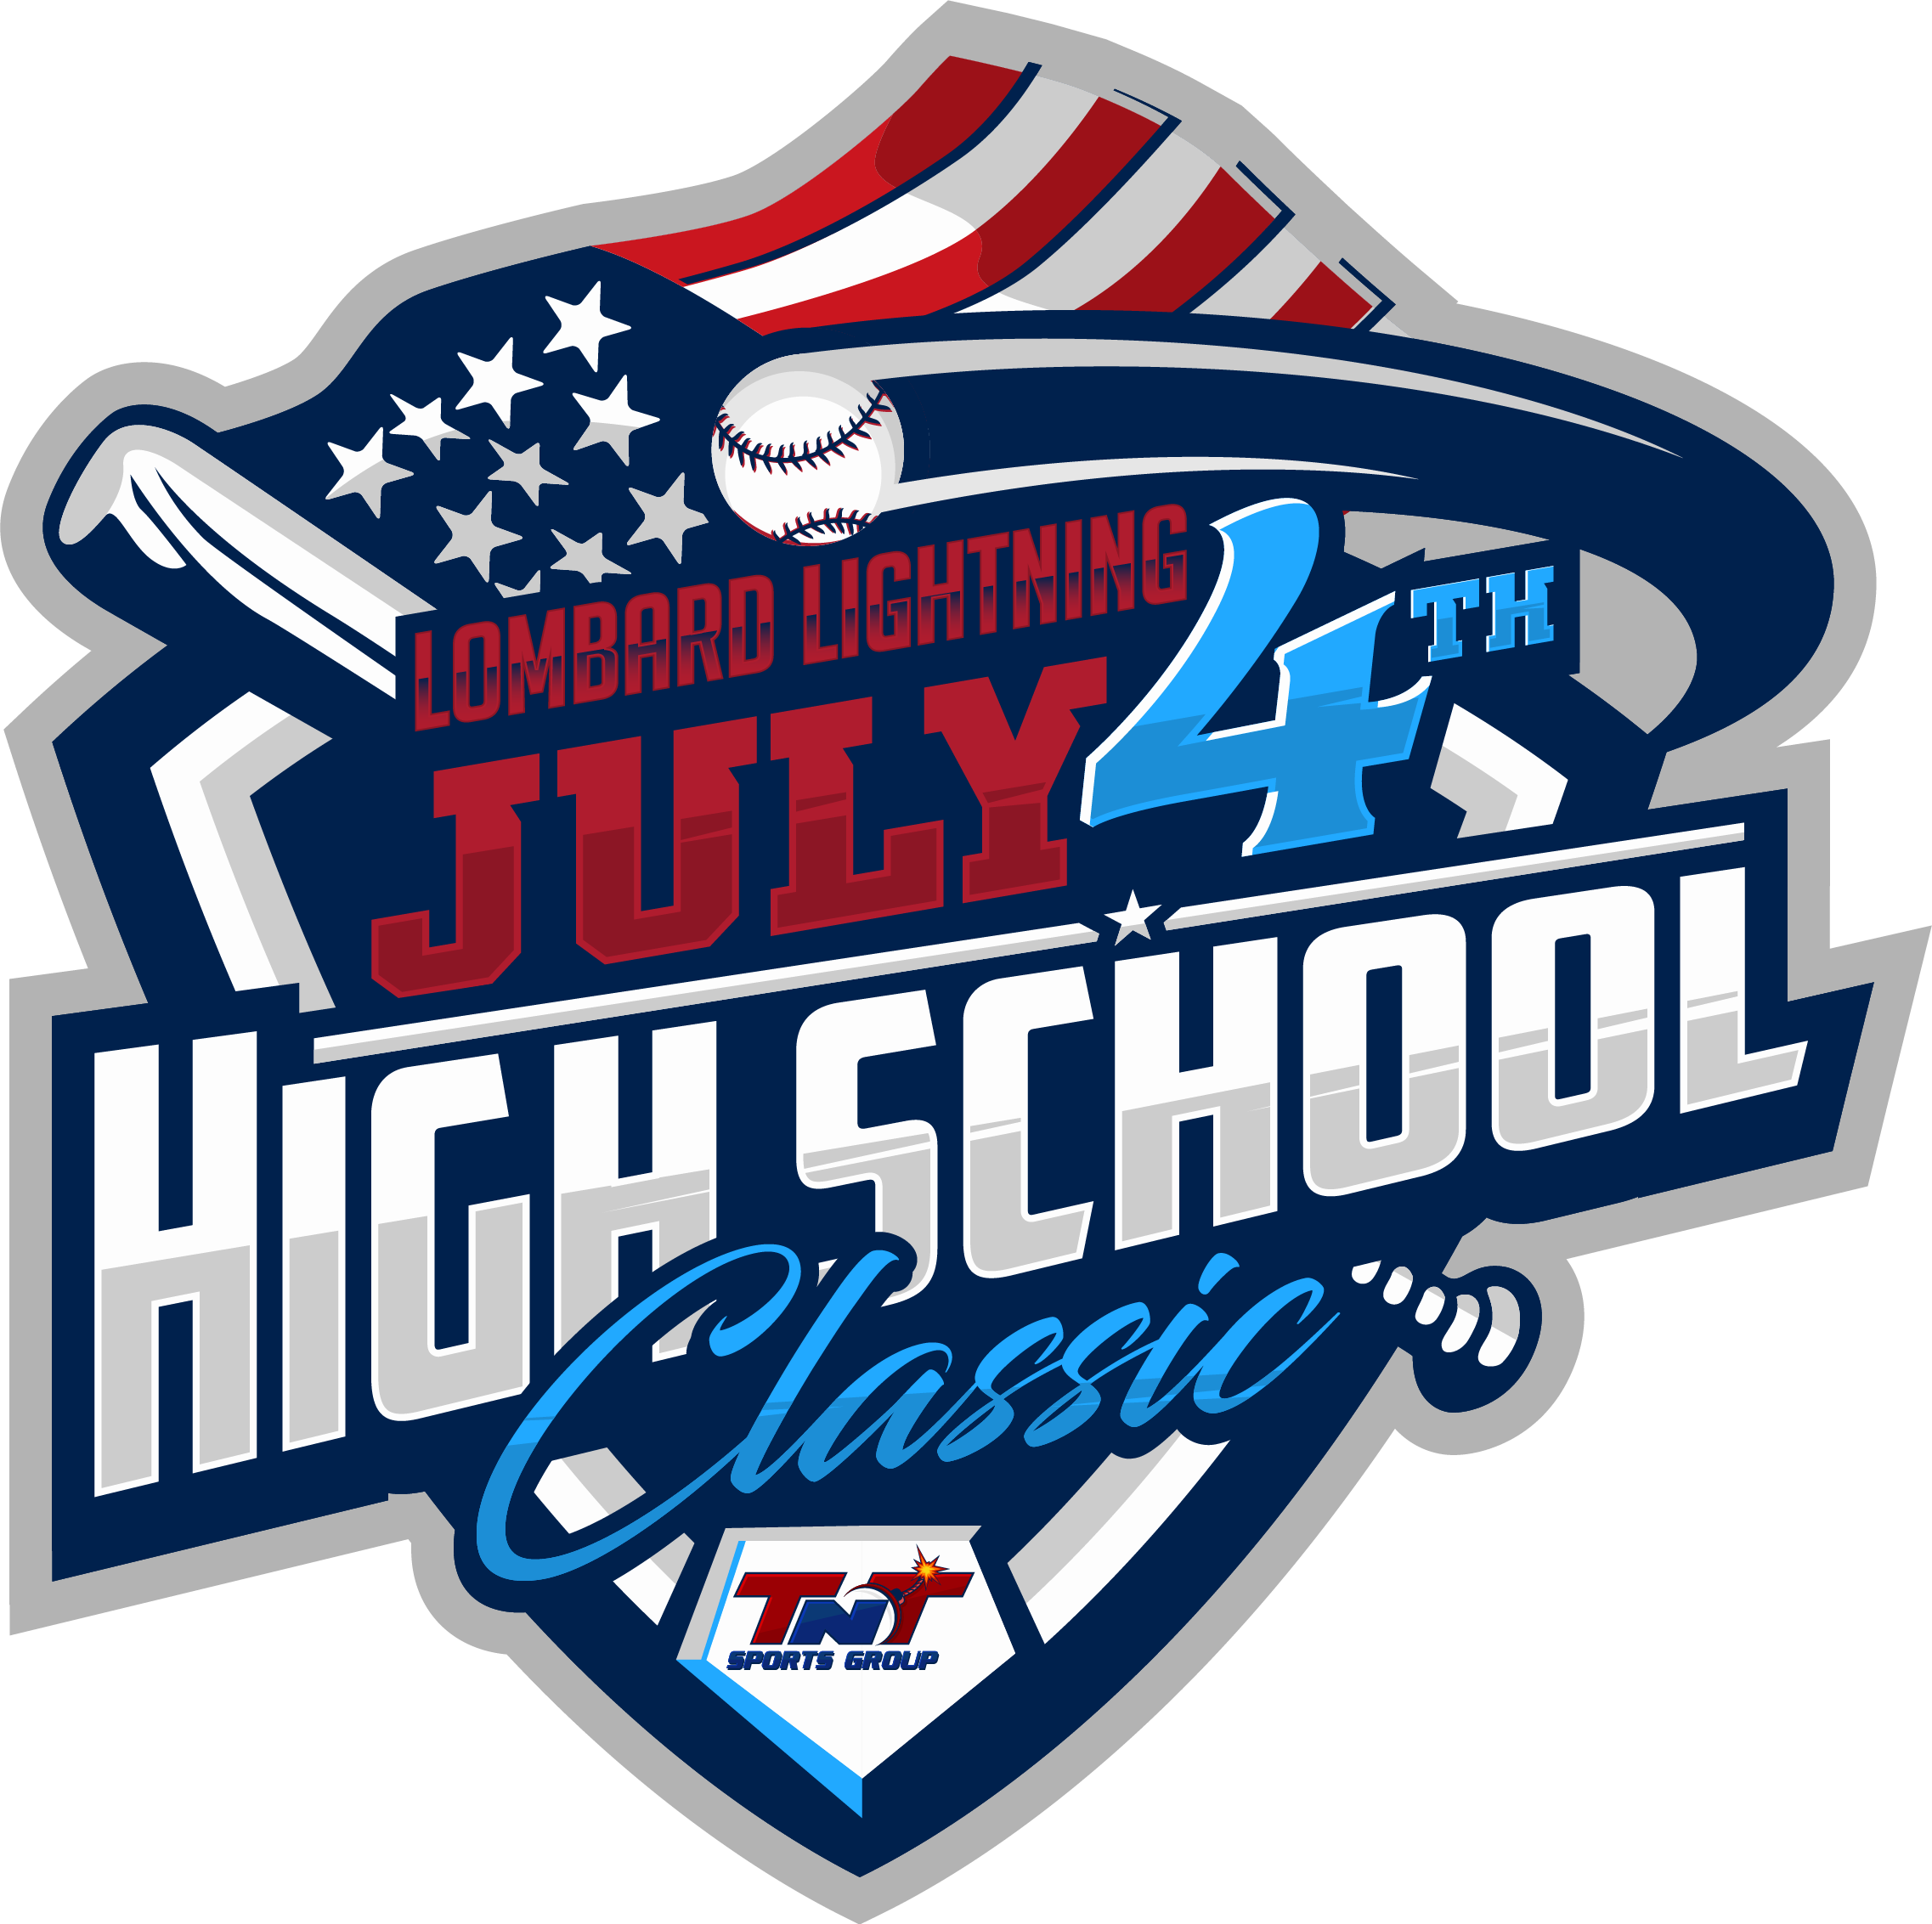 Lombard Lightning High School Classic